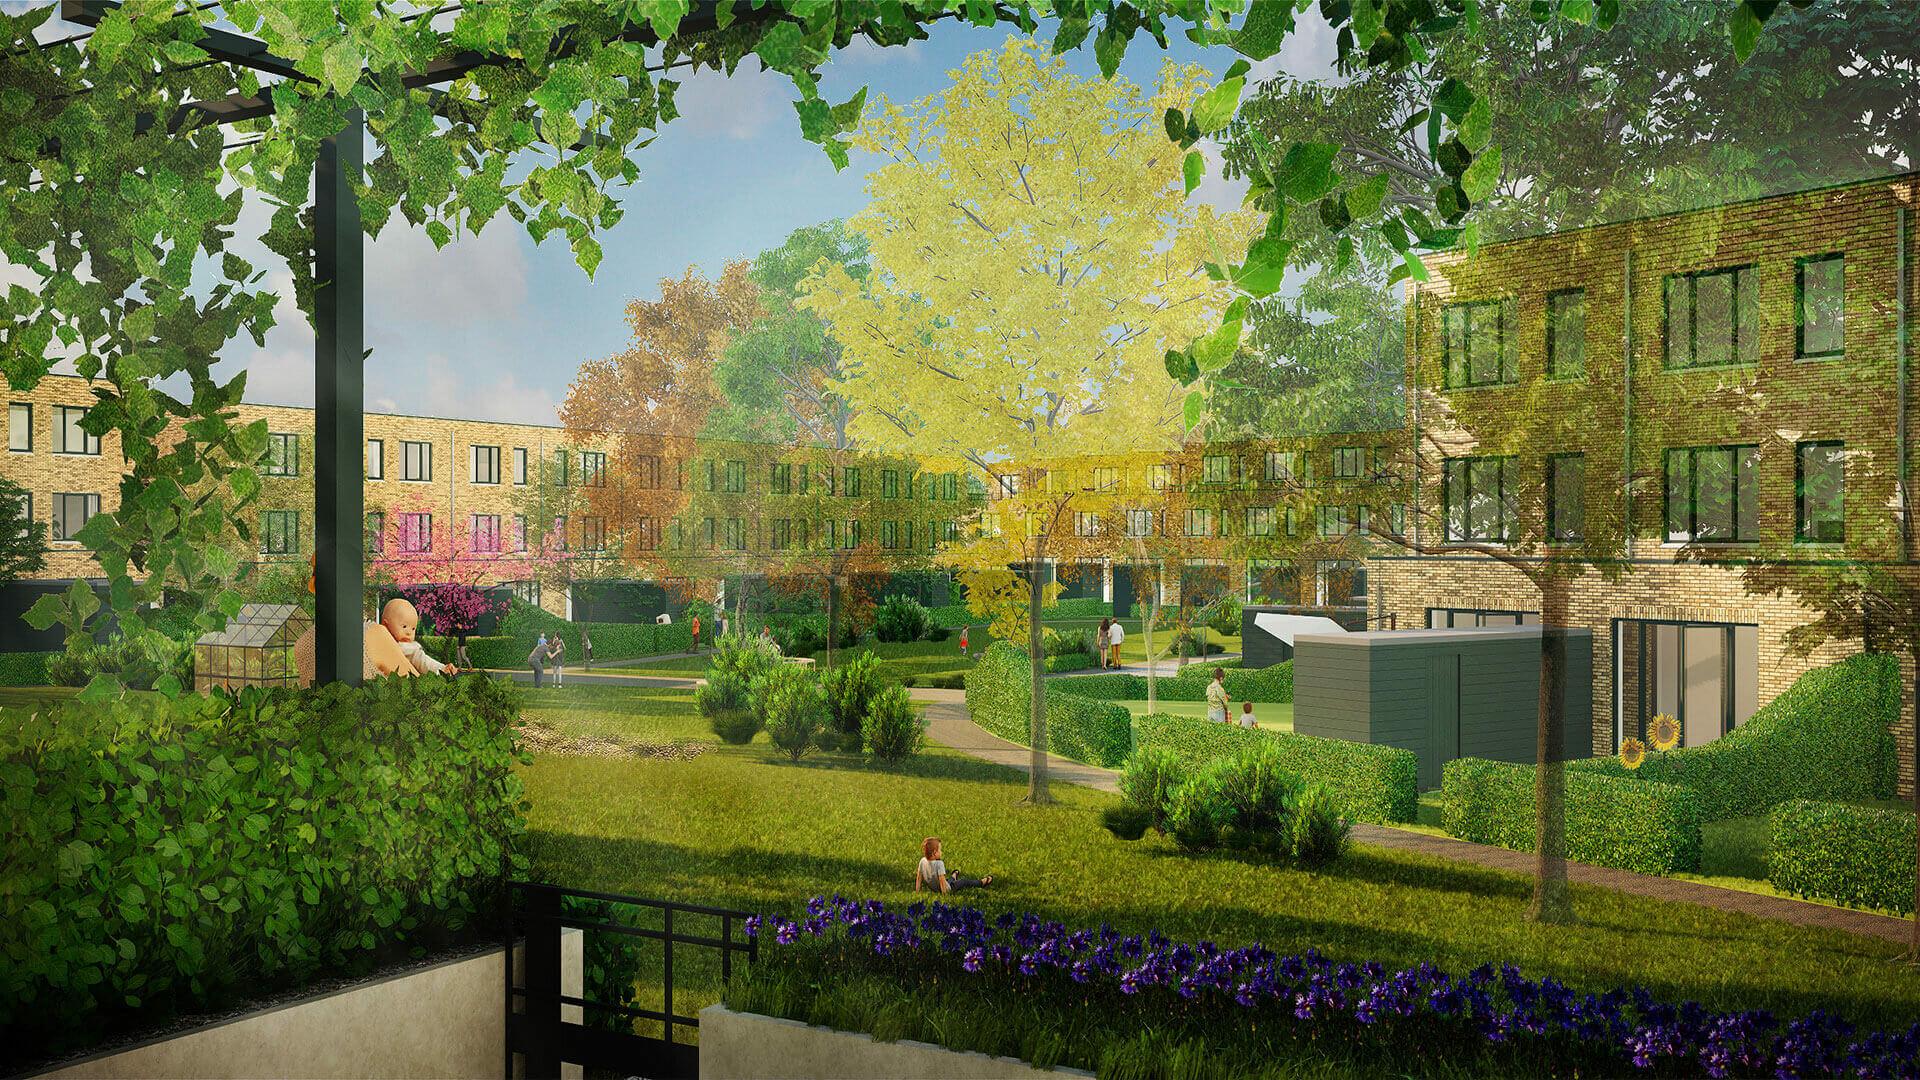 Tuinen van Genta - project - Breda - yoreM - Impressie 05